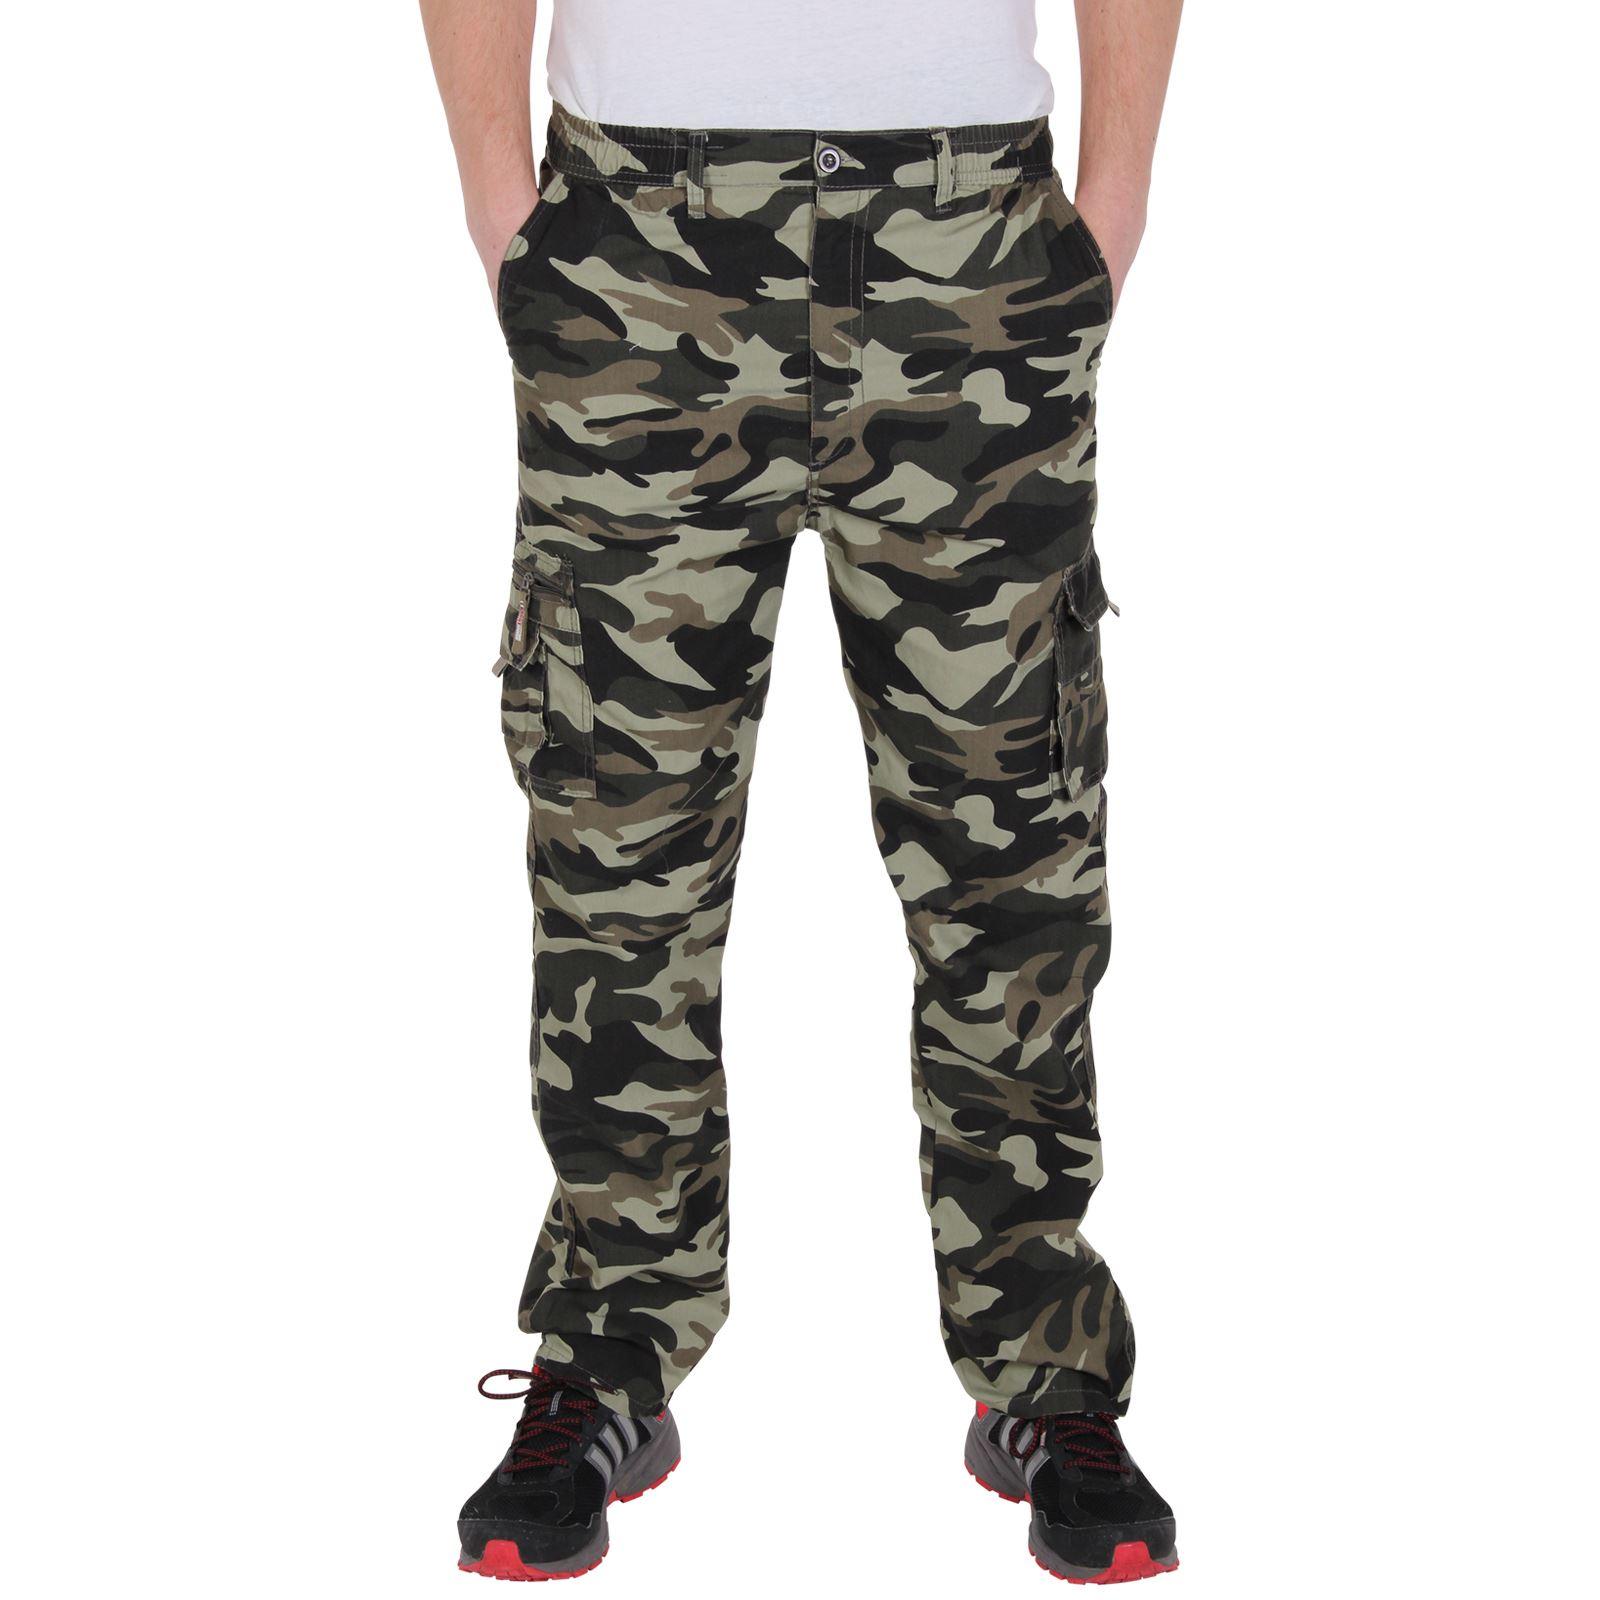 pantalon homme treillis militaire camouflage cargo arm e multi poches ebay. Black Bedroom Furniture Sets. Home Design Ideas